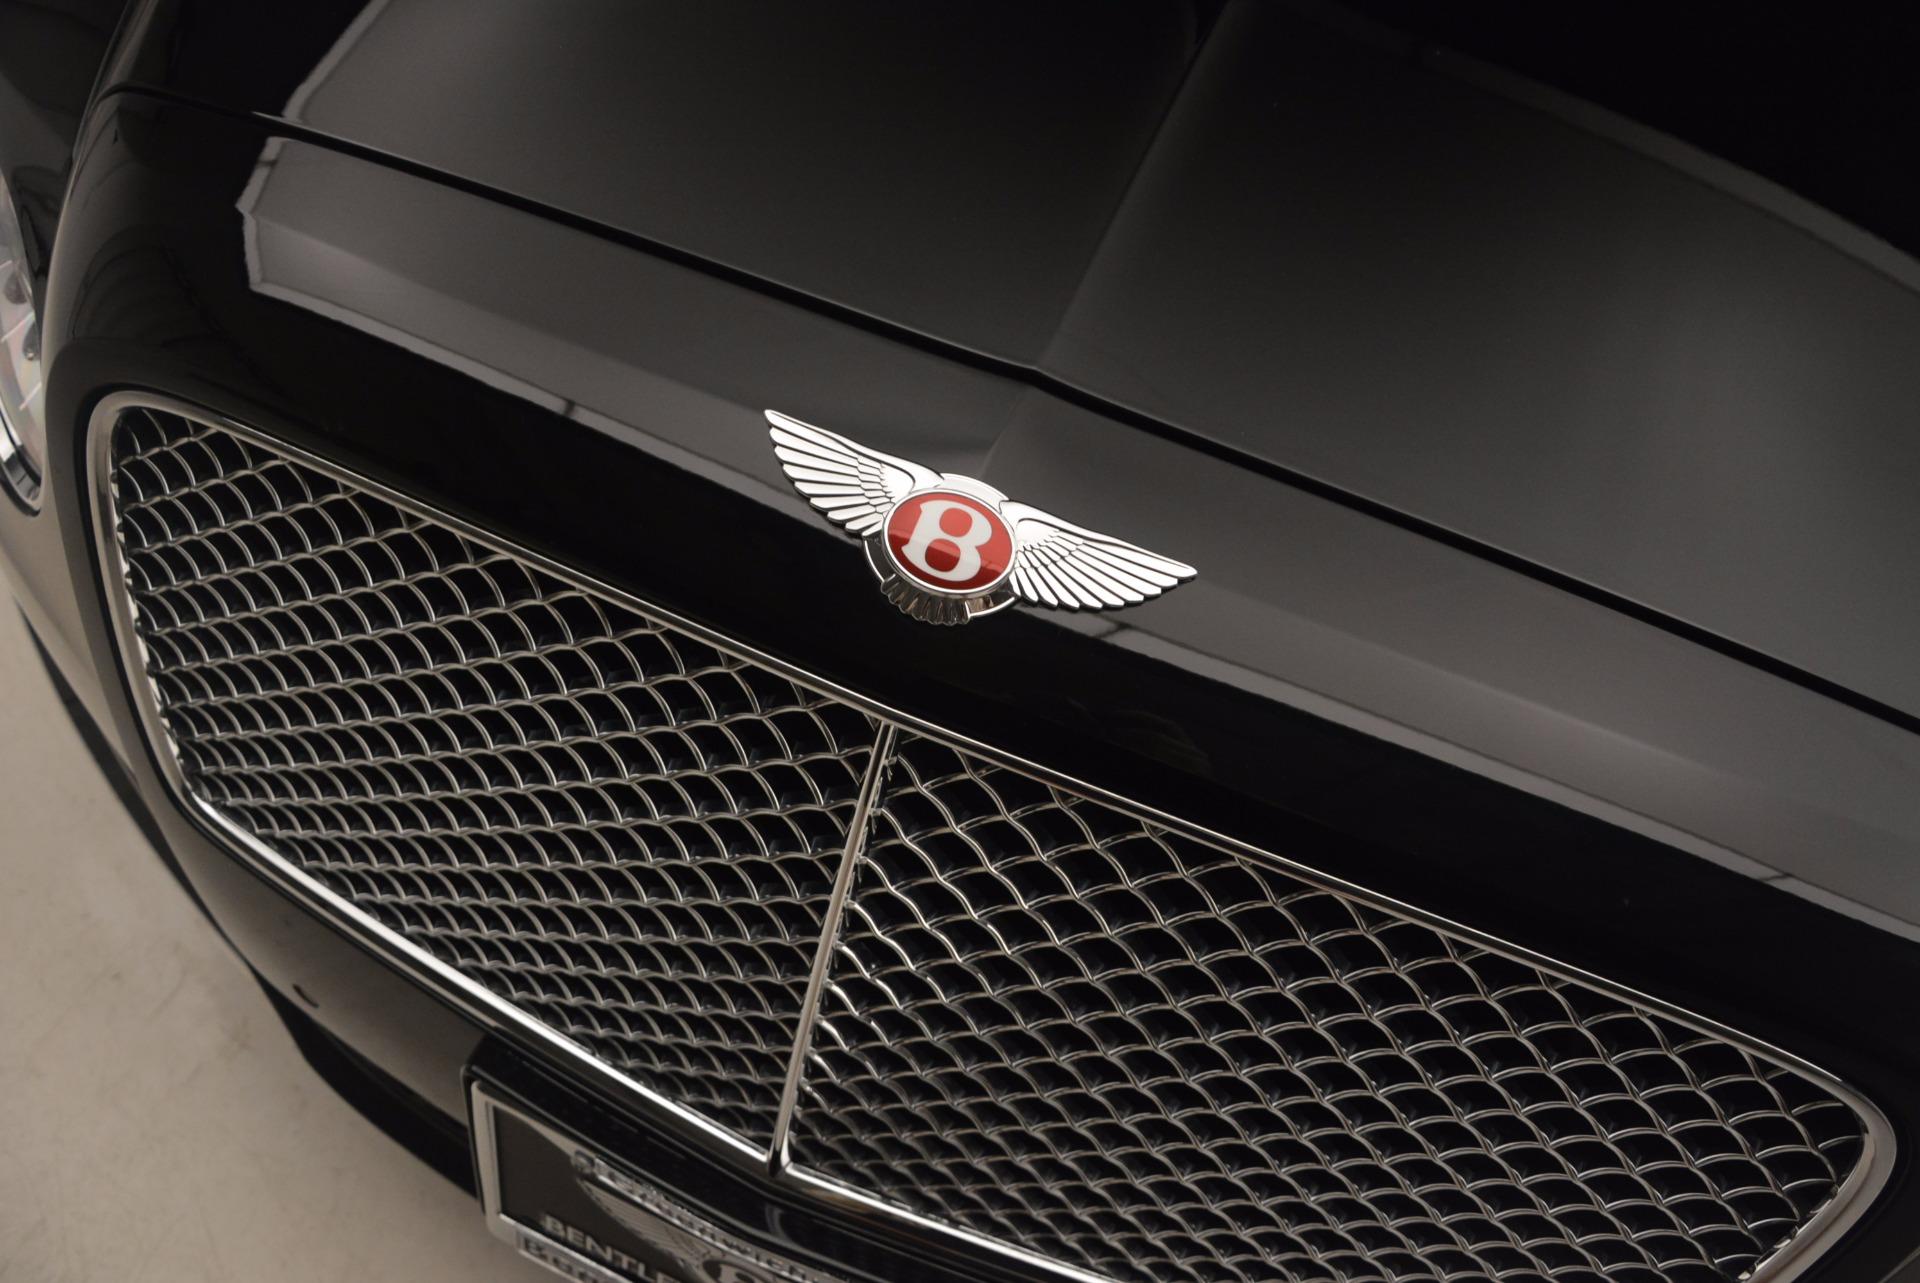 Used 2015 Bentley Flying Spur V8 For Sale In Westport, CT 1199_p17